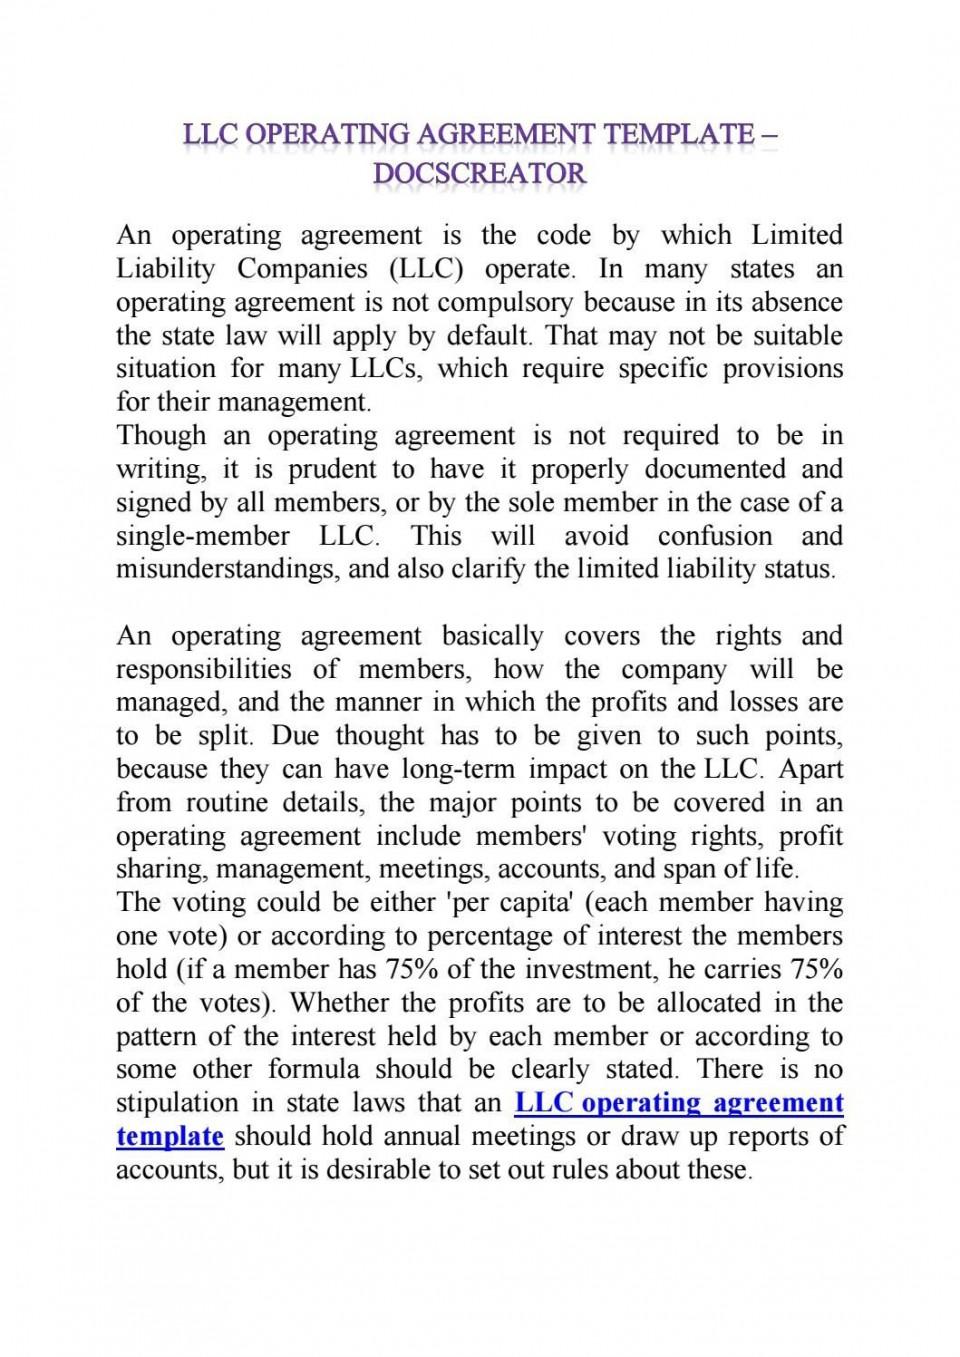 008 Simple Operation Agreement Llc Template Example  Operating Florida Indiana Single Member California960